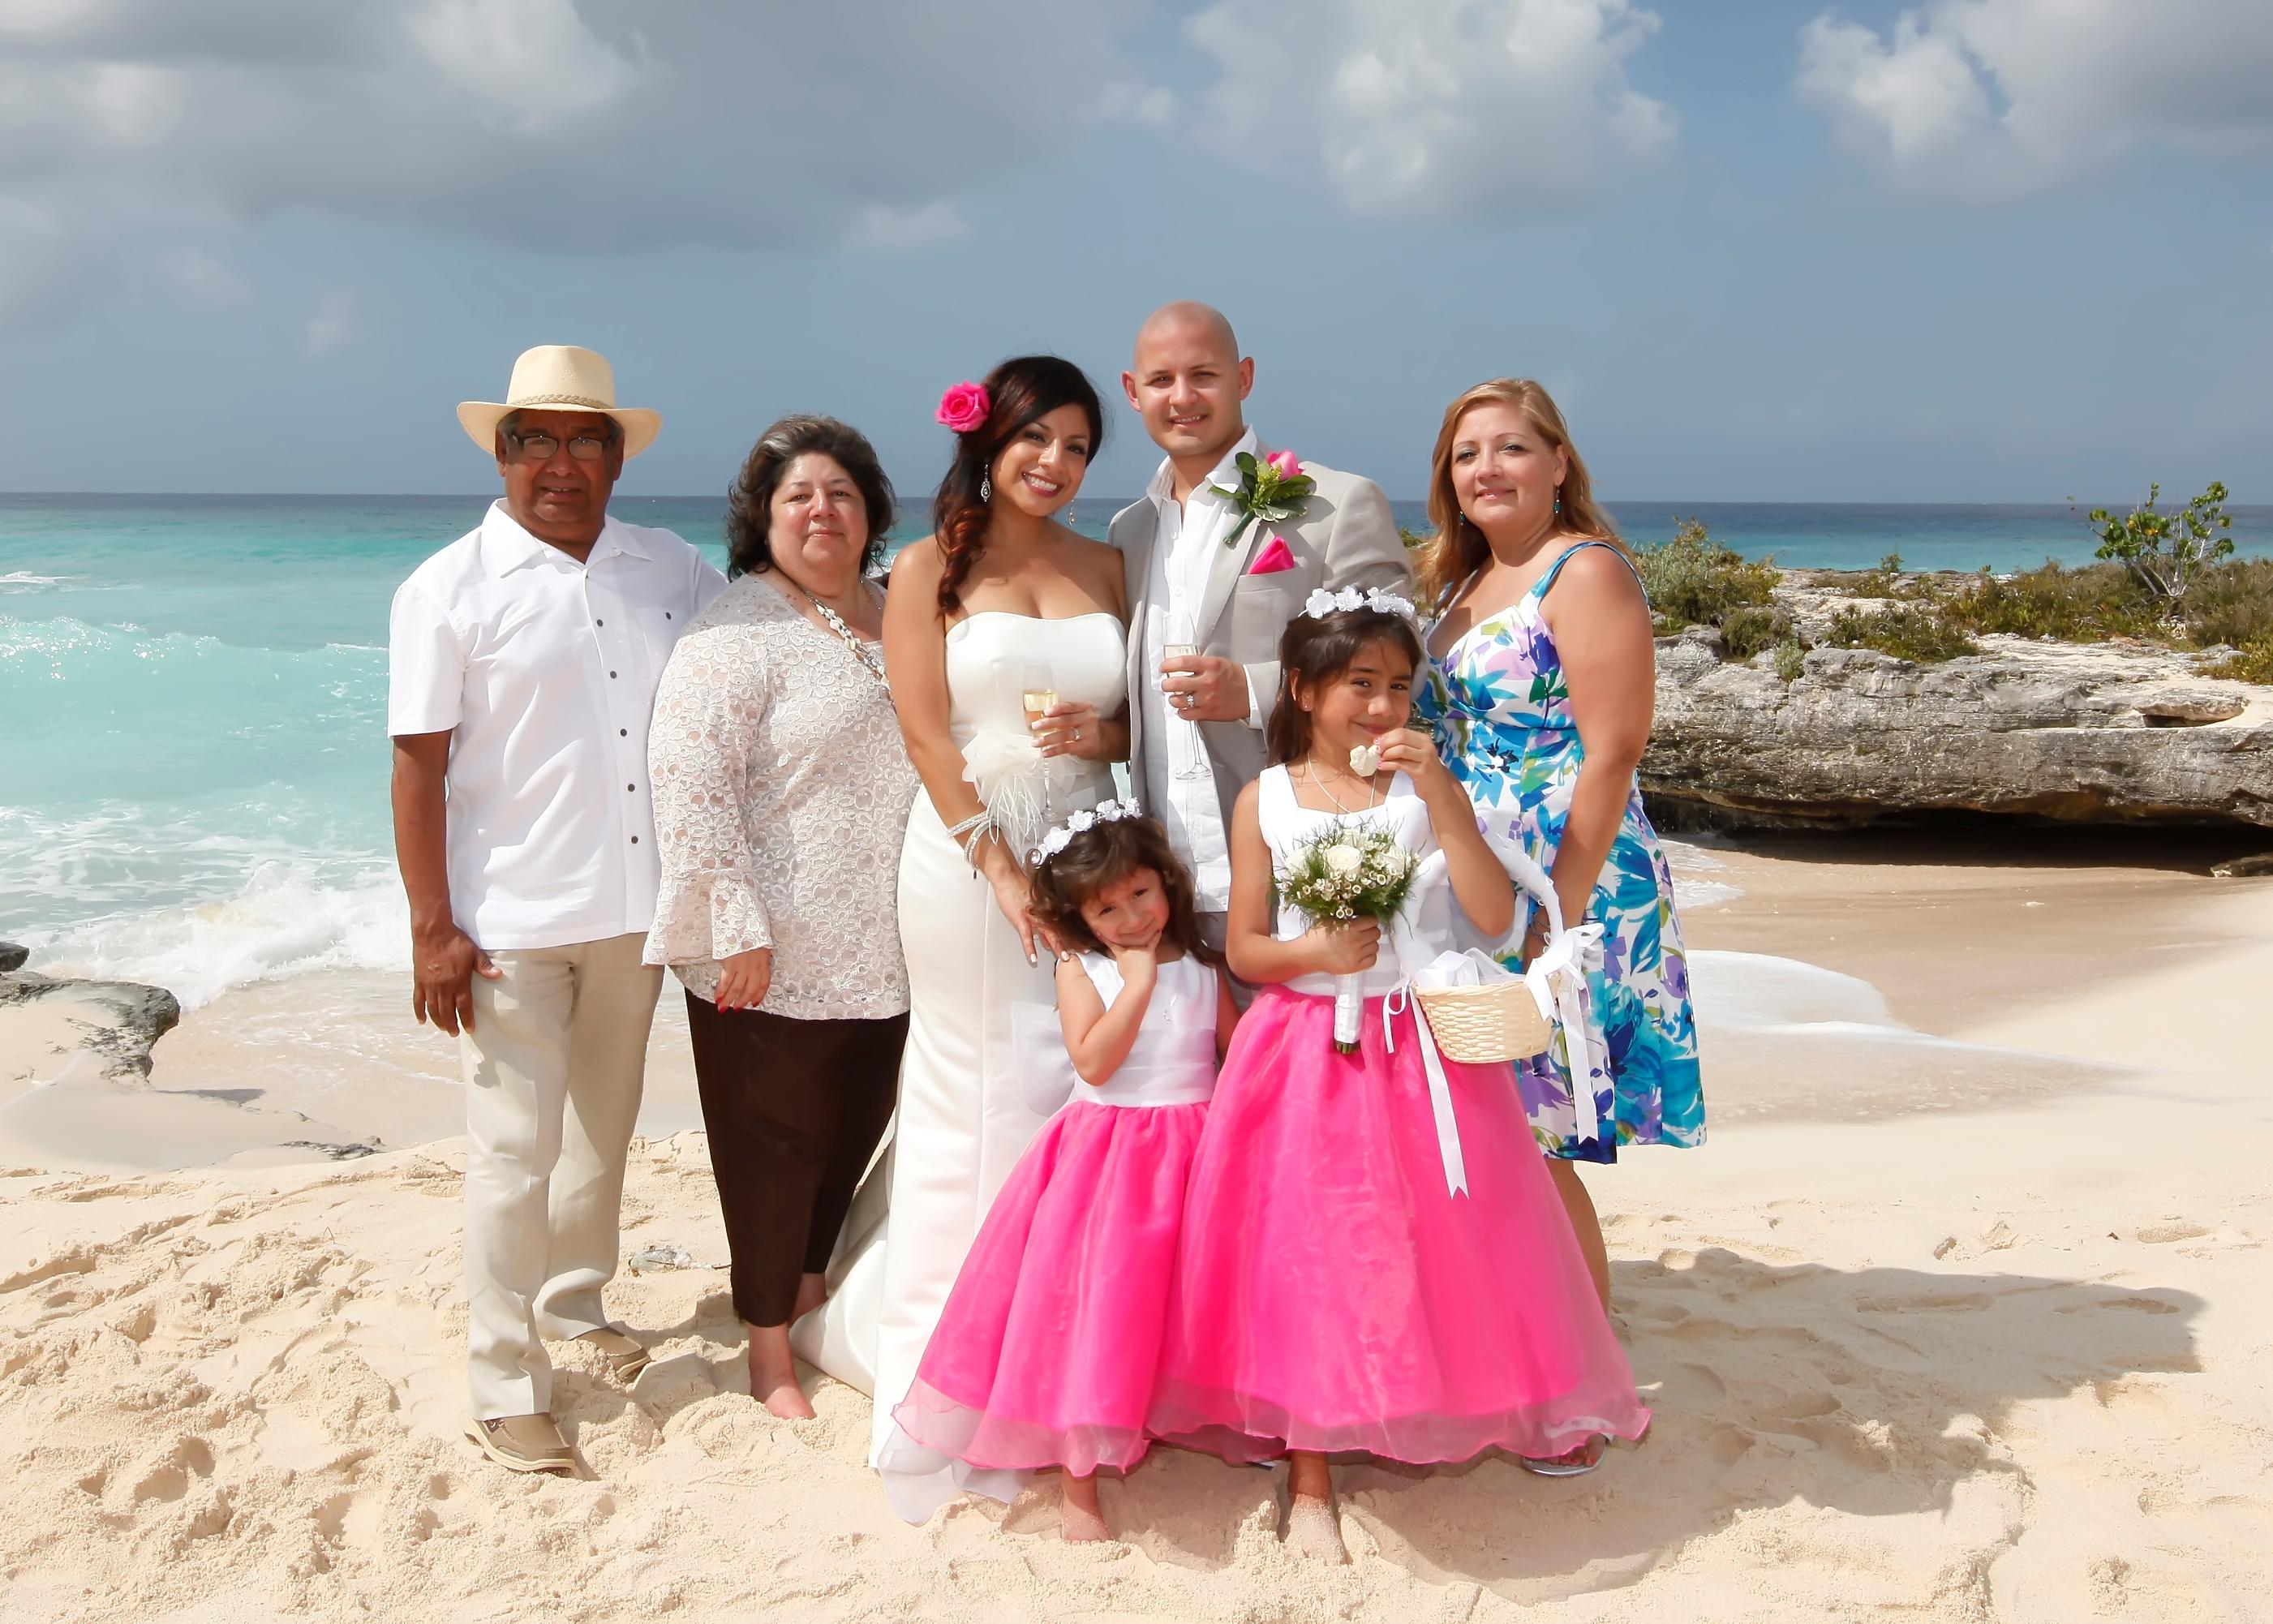 wedding trend ideas beach wedding flower girl dresses. Black Bedroom Furniture Sets. Home Design Ideas